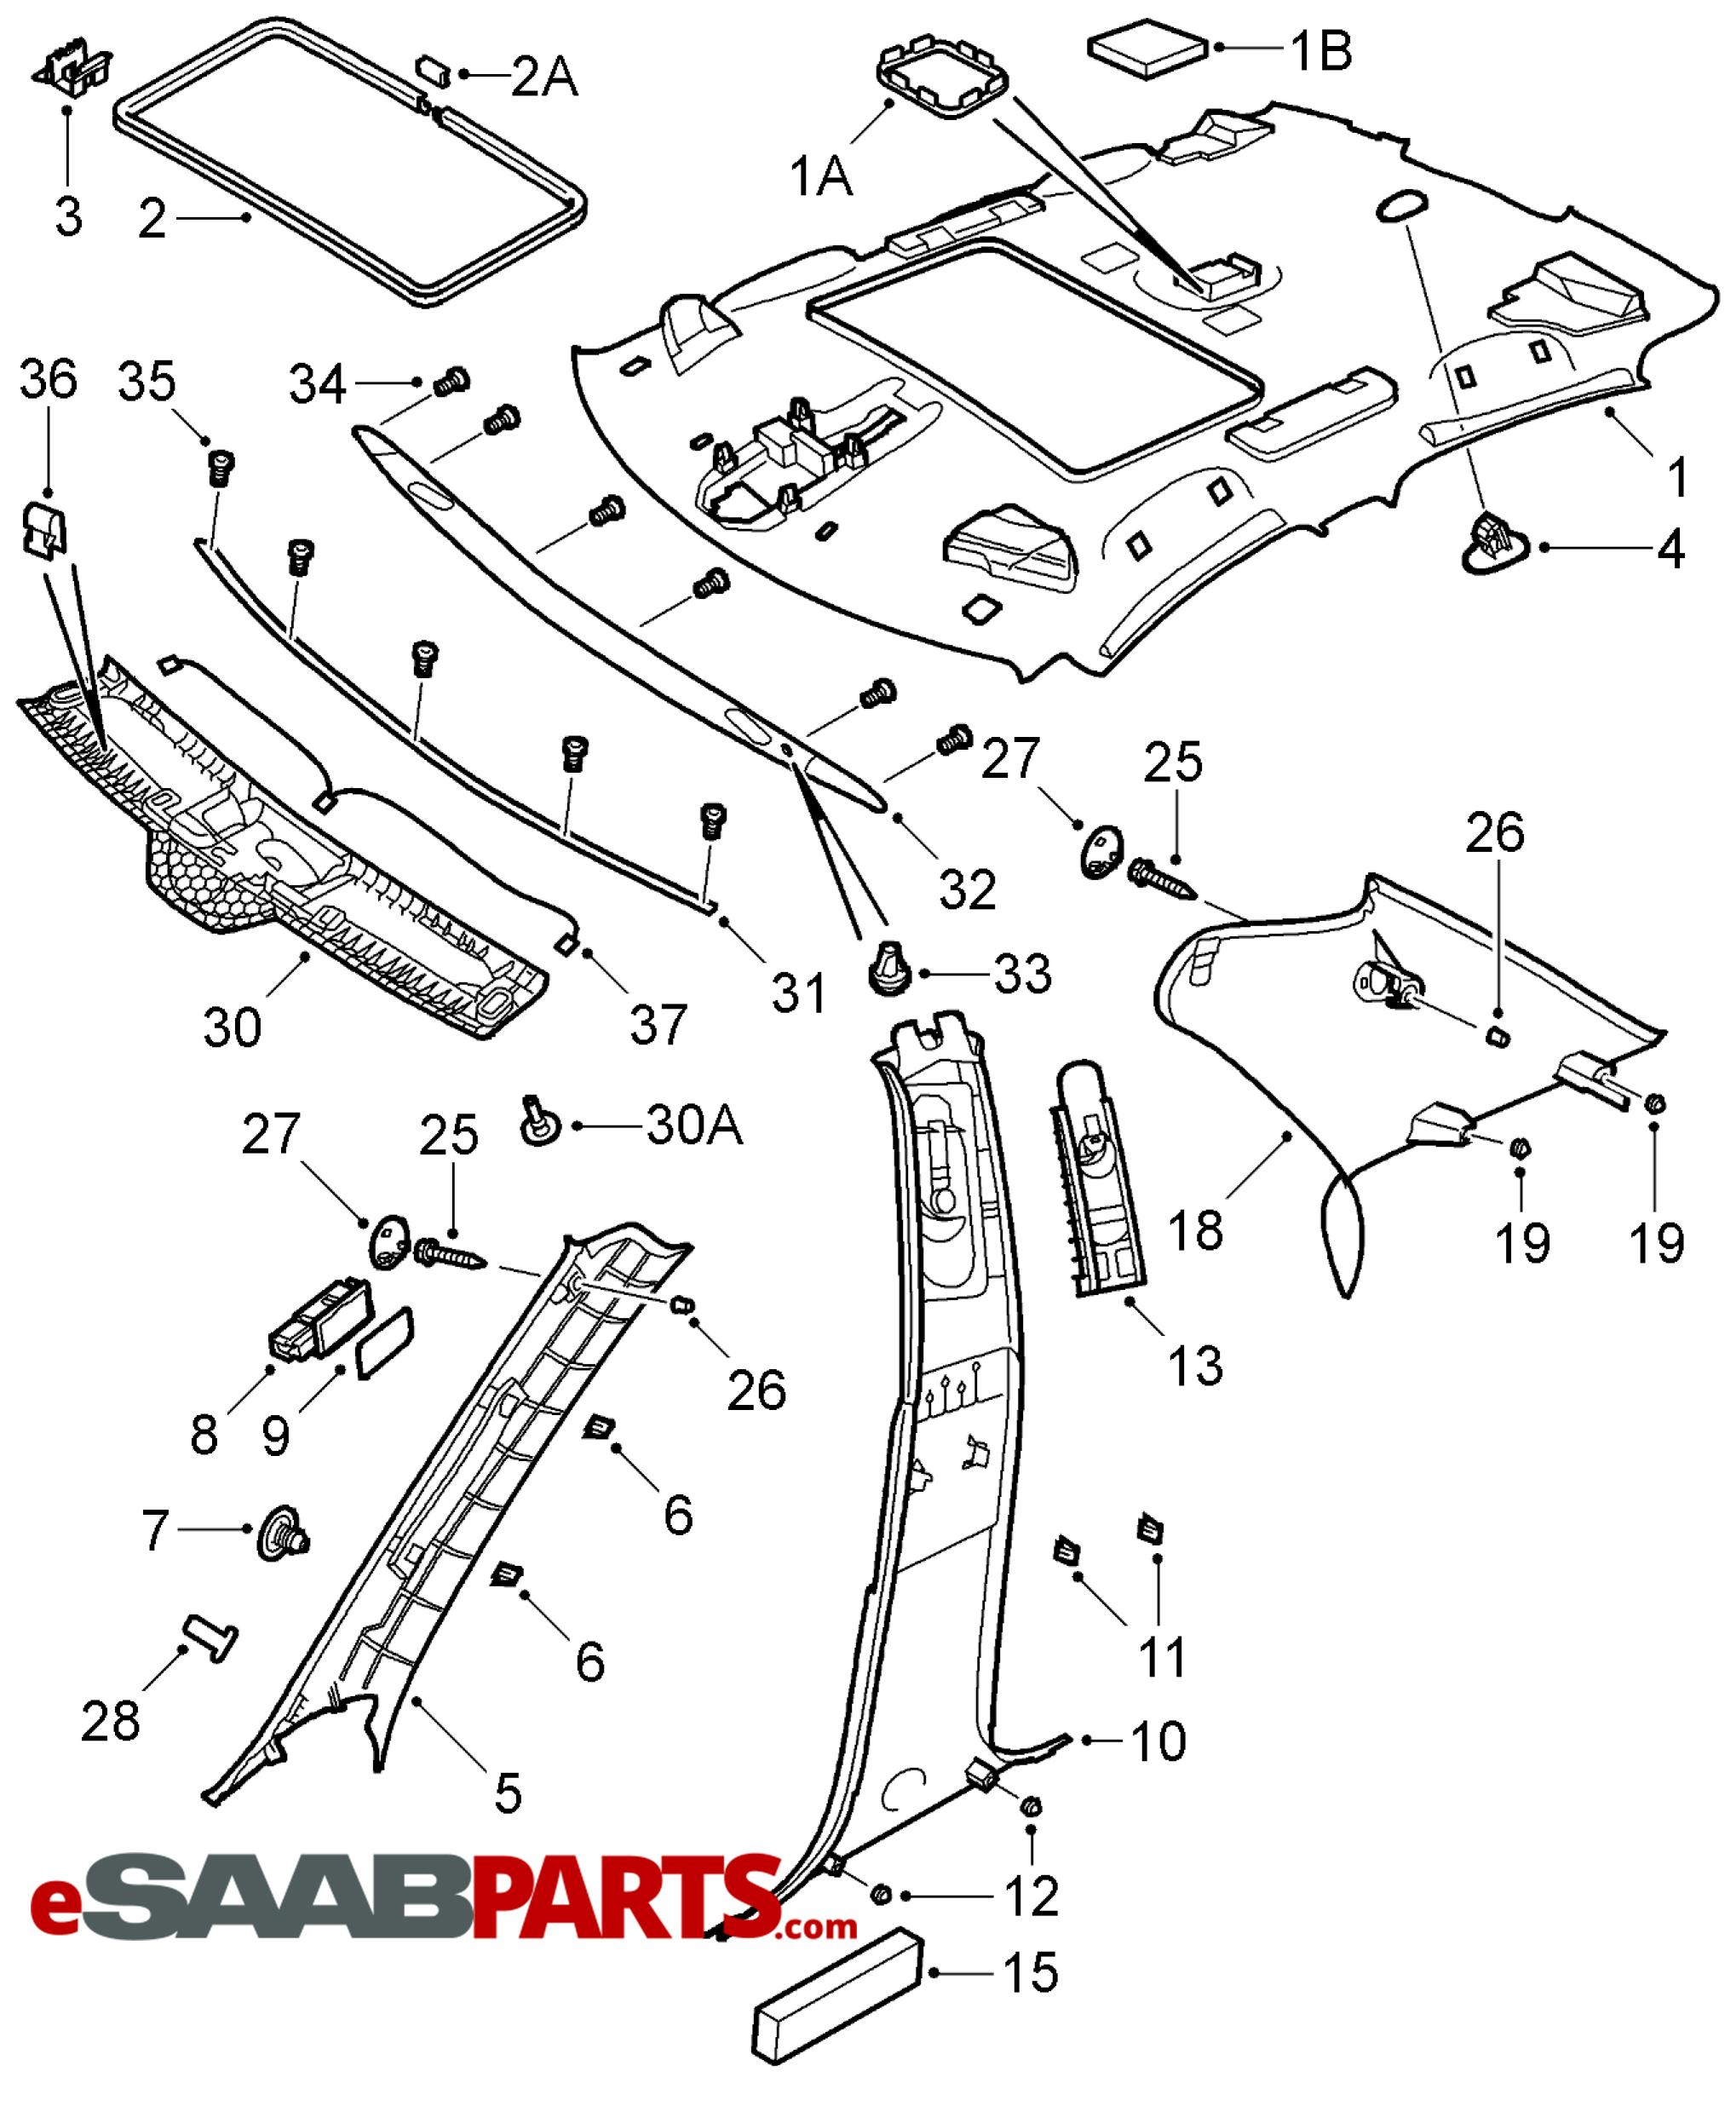 car pillar diagram